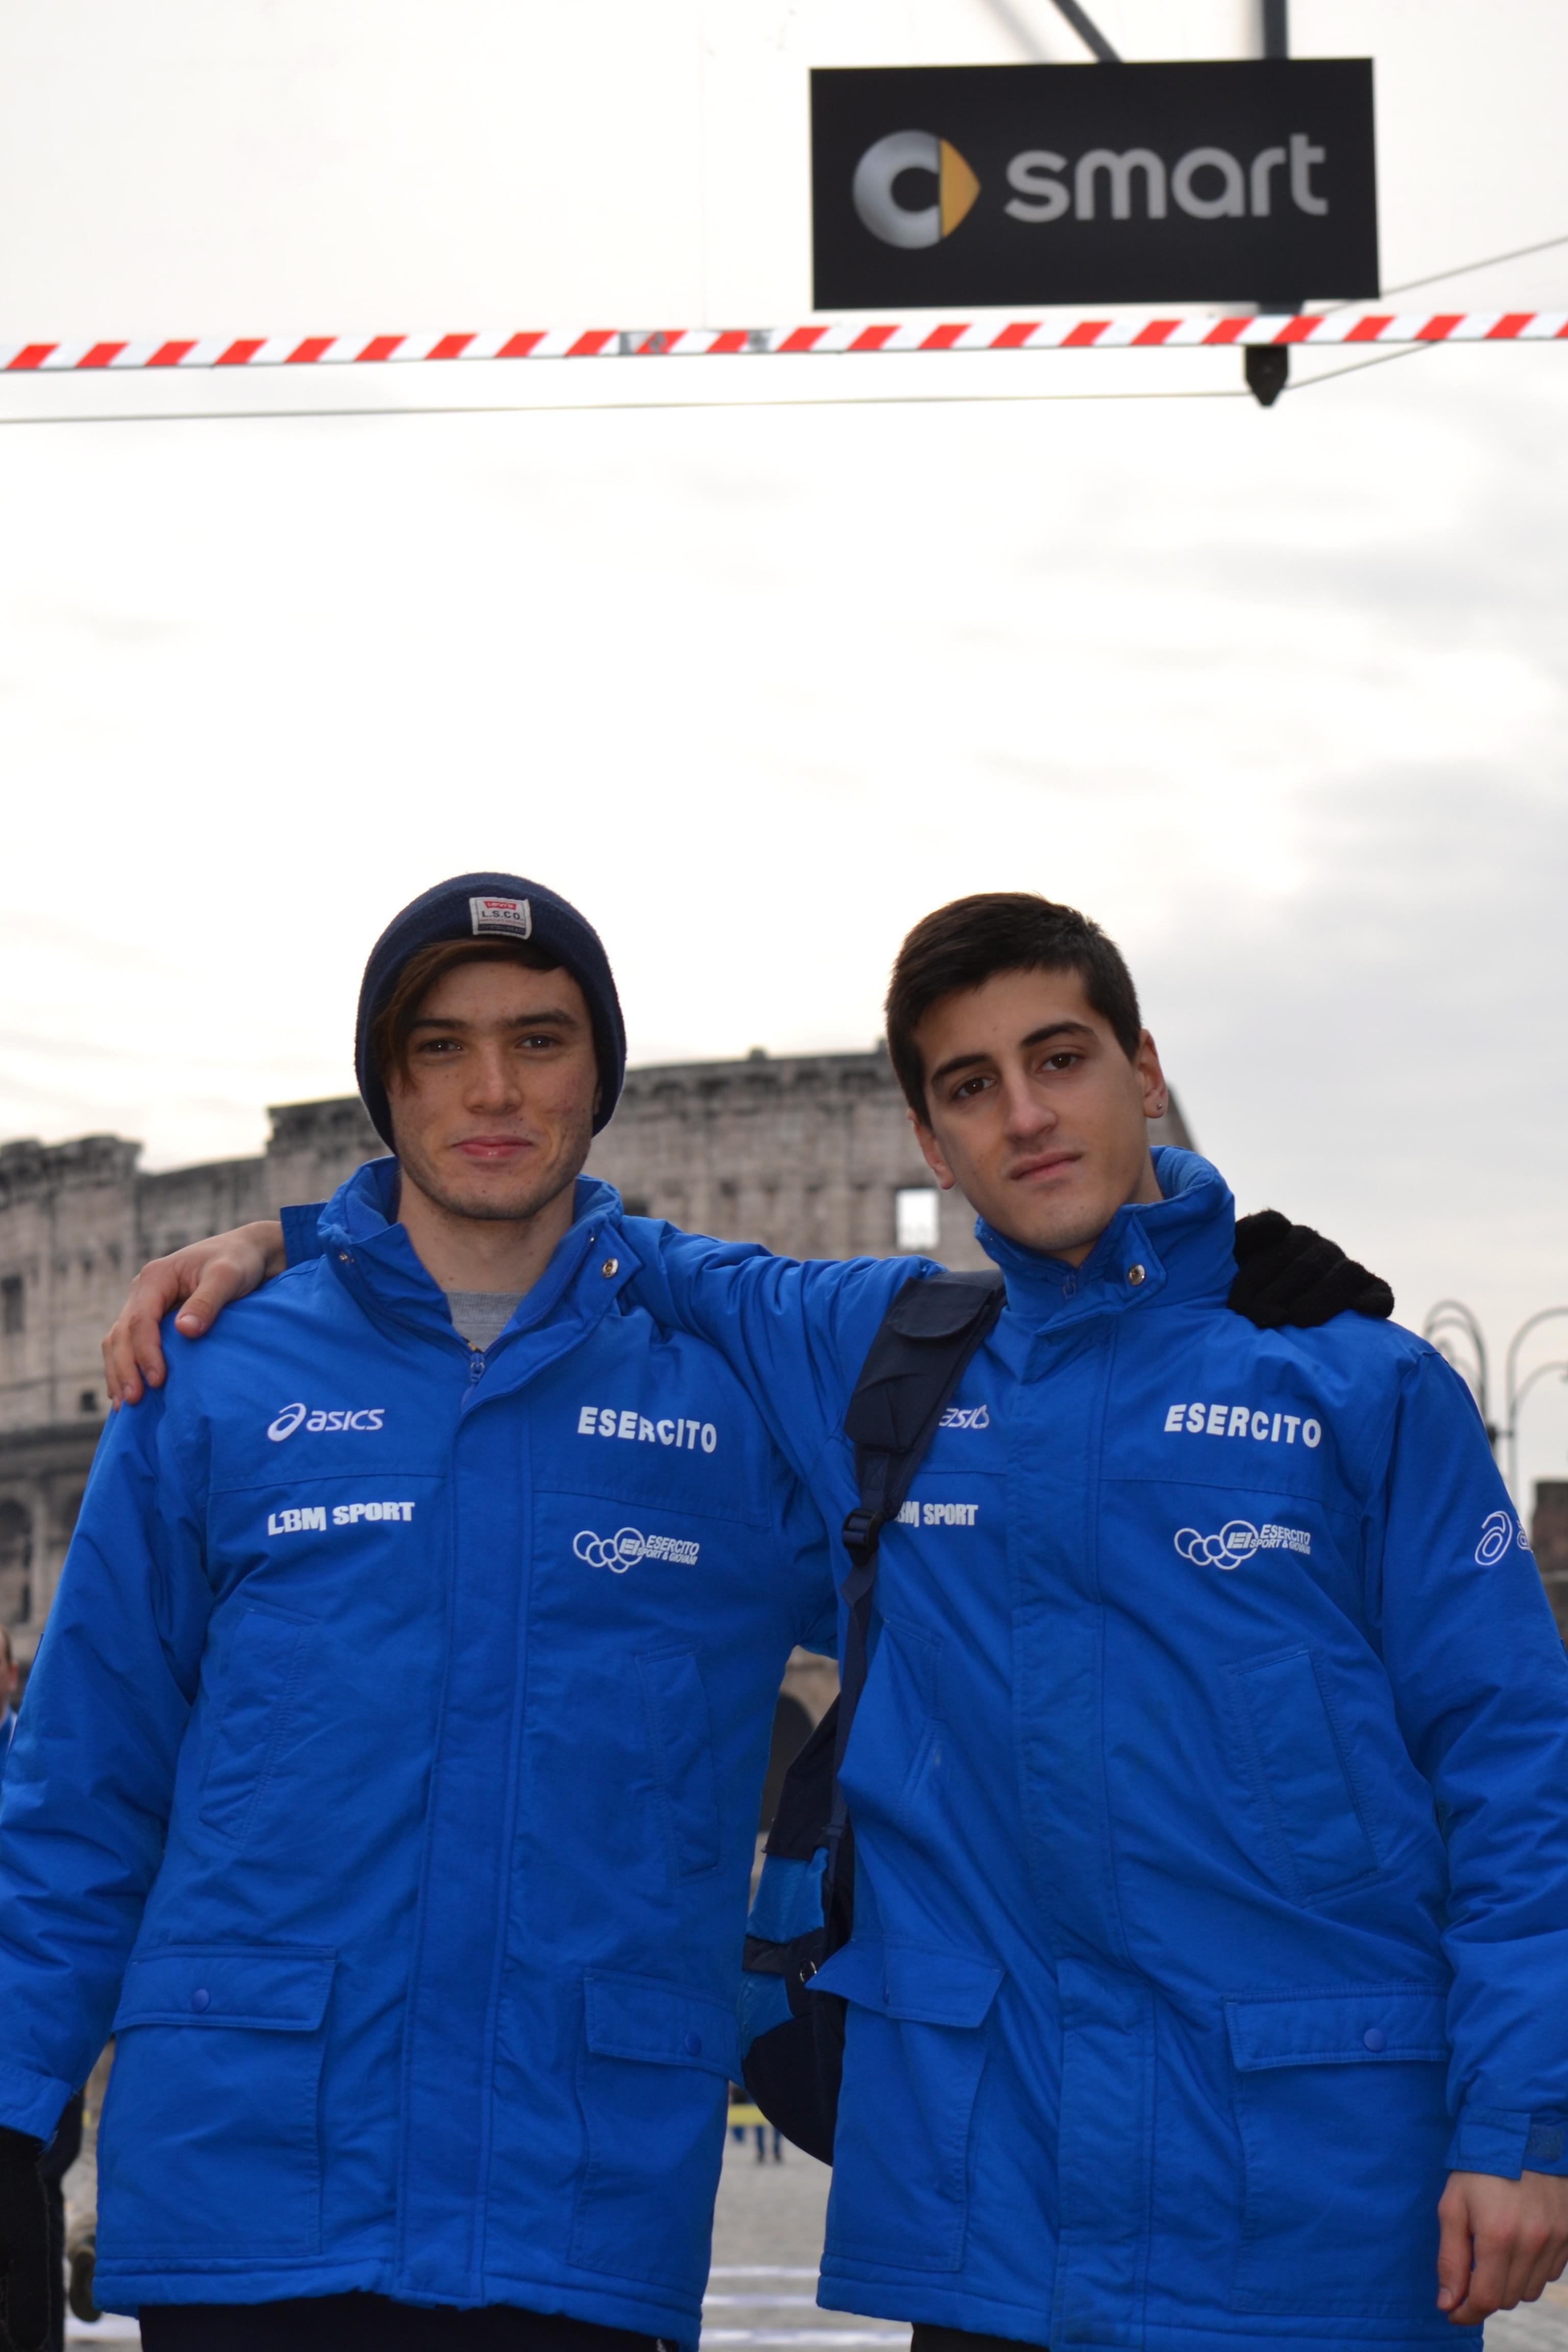 maratona-di-roma-2013-064